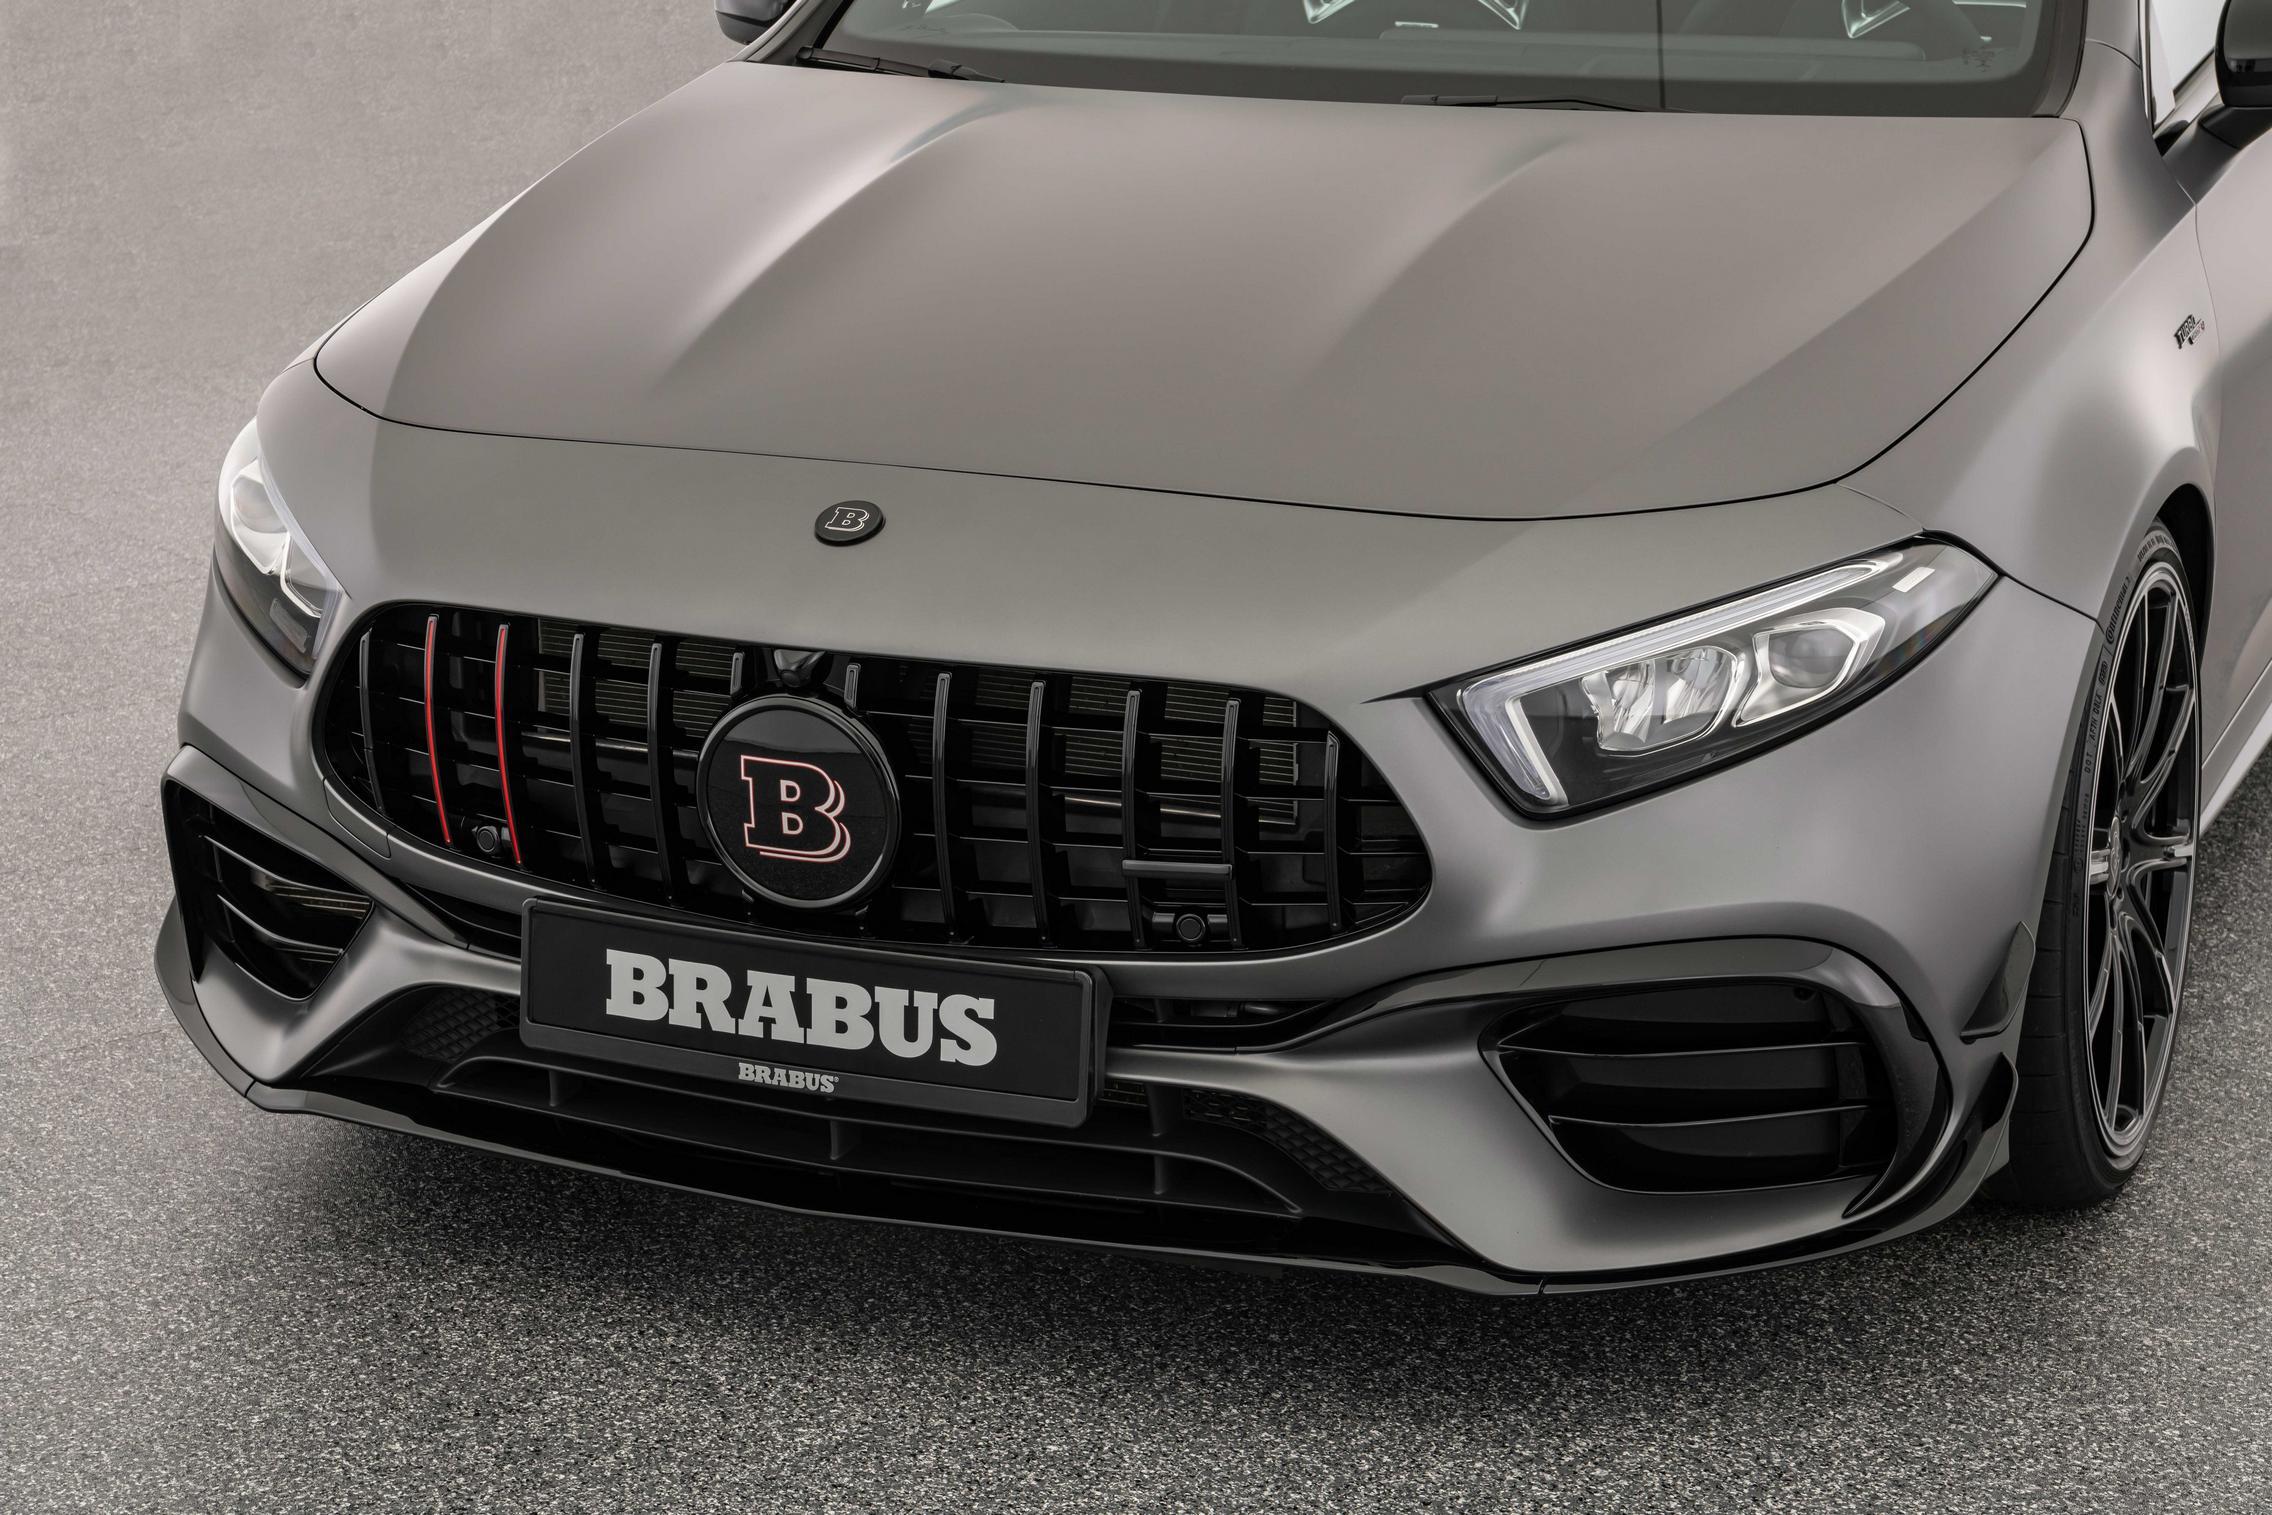 Brabus A45 S AMG headlights